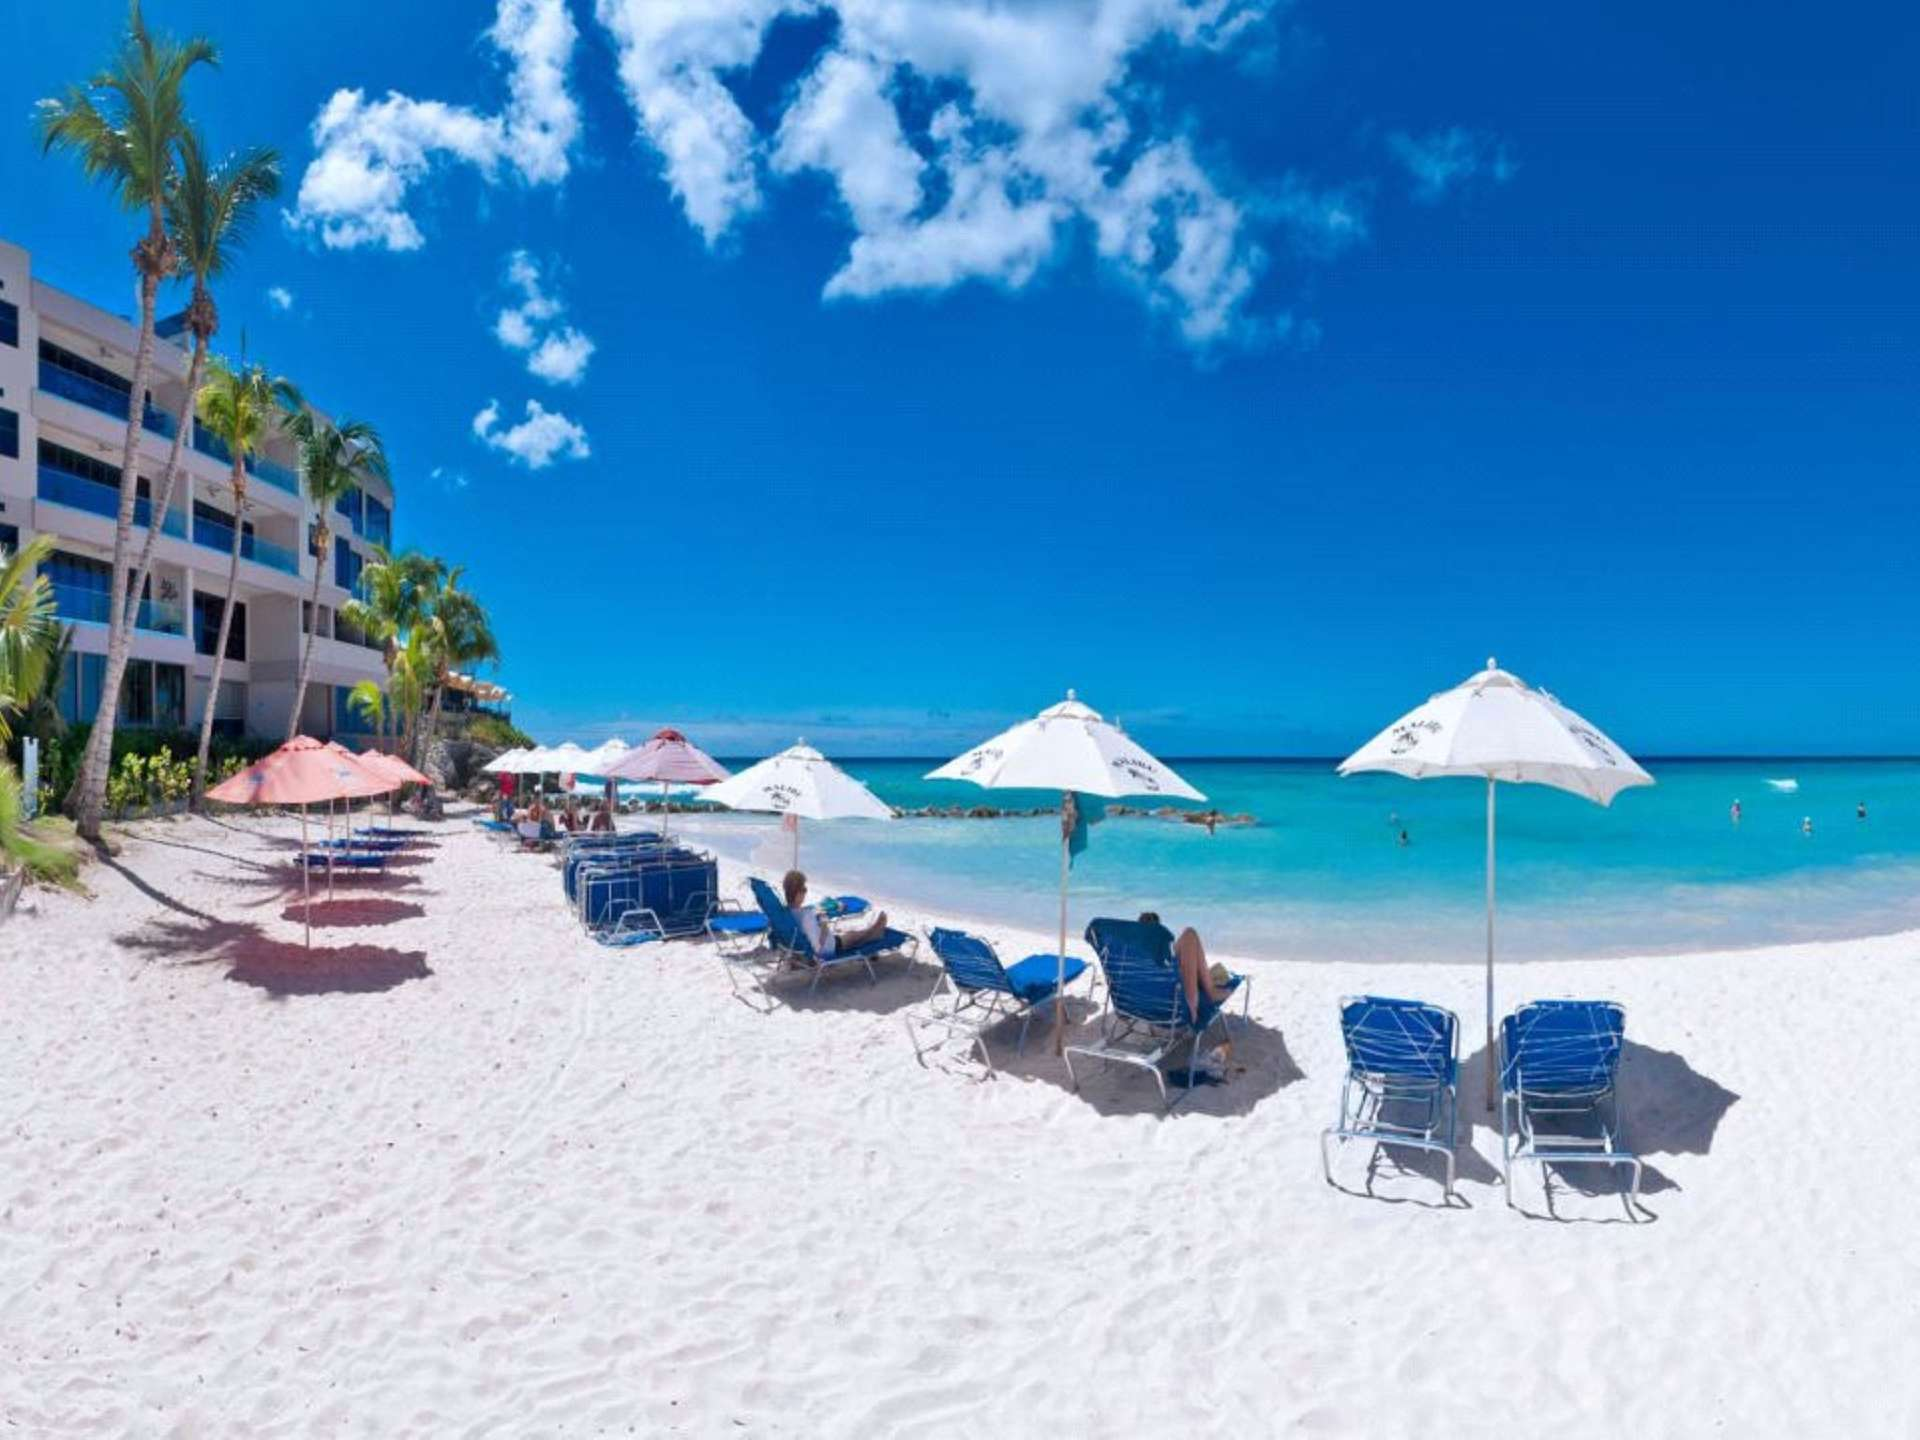 Savills Capri One Rockley Beach Christ Church Barbados Property For